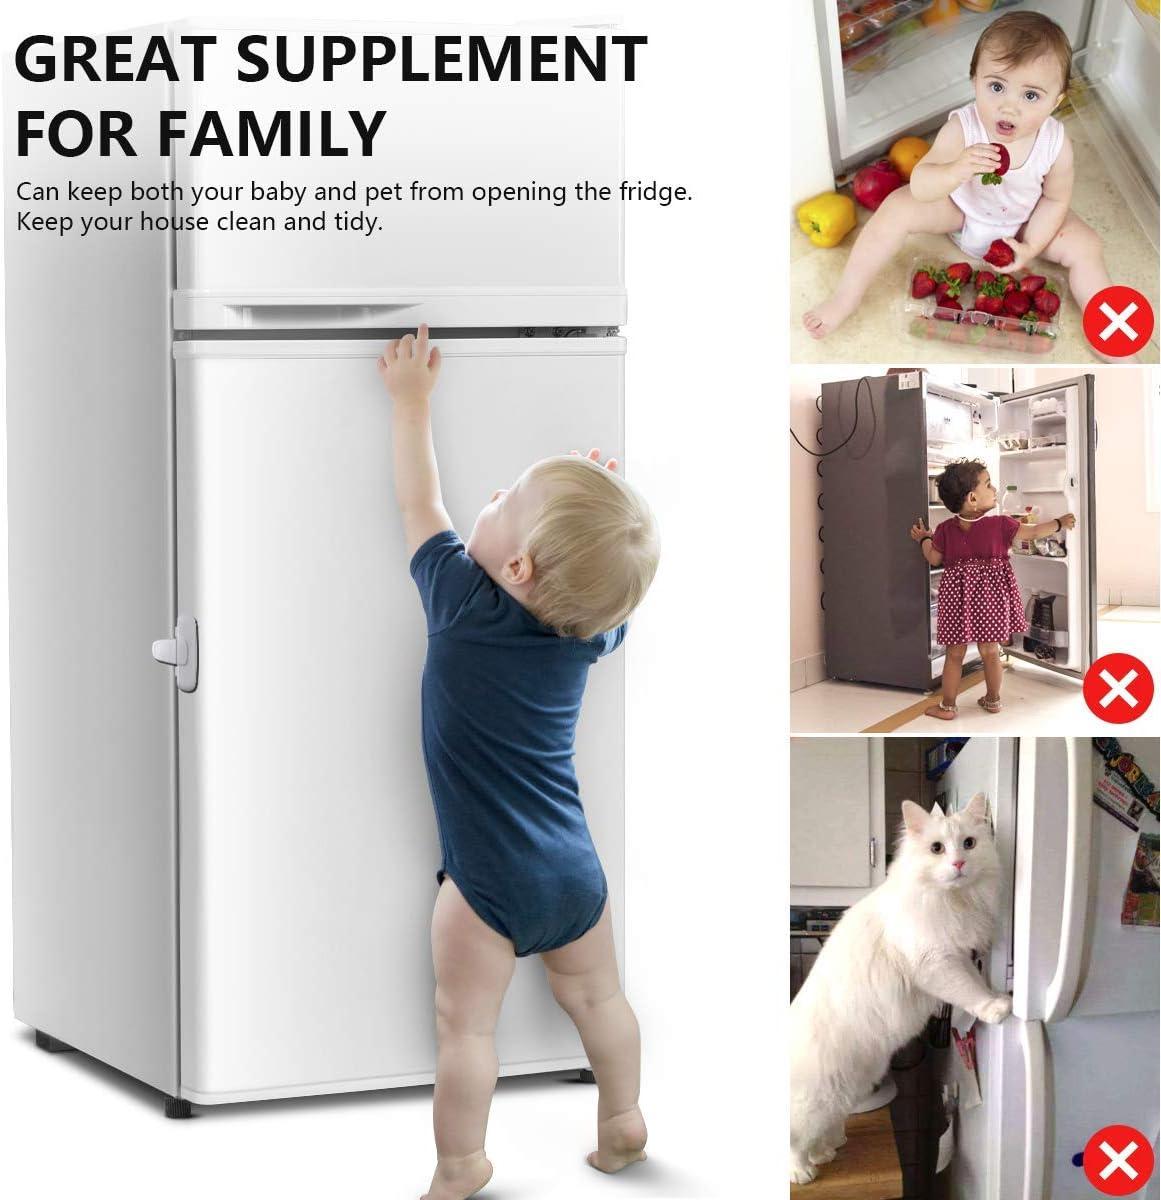 Latch Catch Freezer Locks Toddler Kids Child Baby Safety Child Fridge Lock Home Fridge Door Lock Easy to Install 1 Pack, White